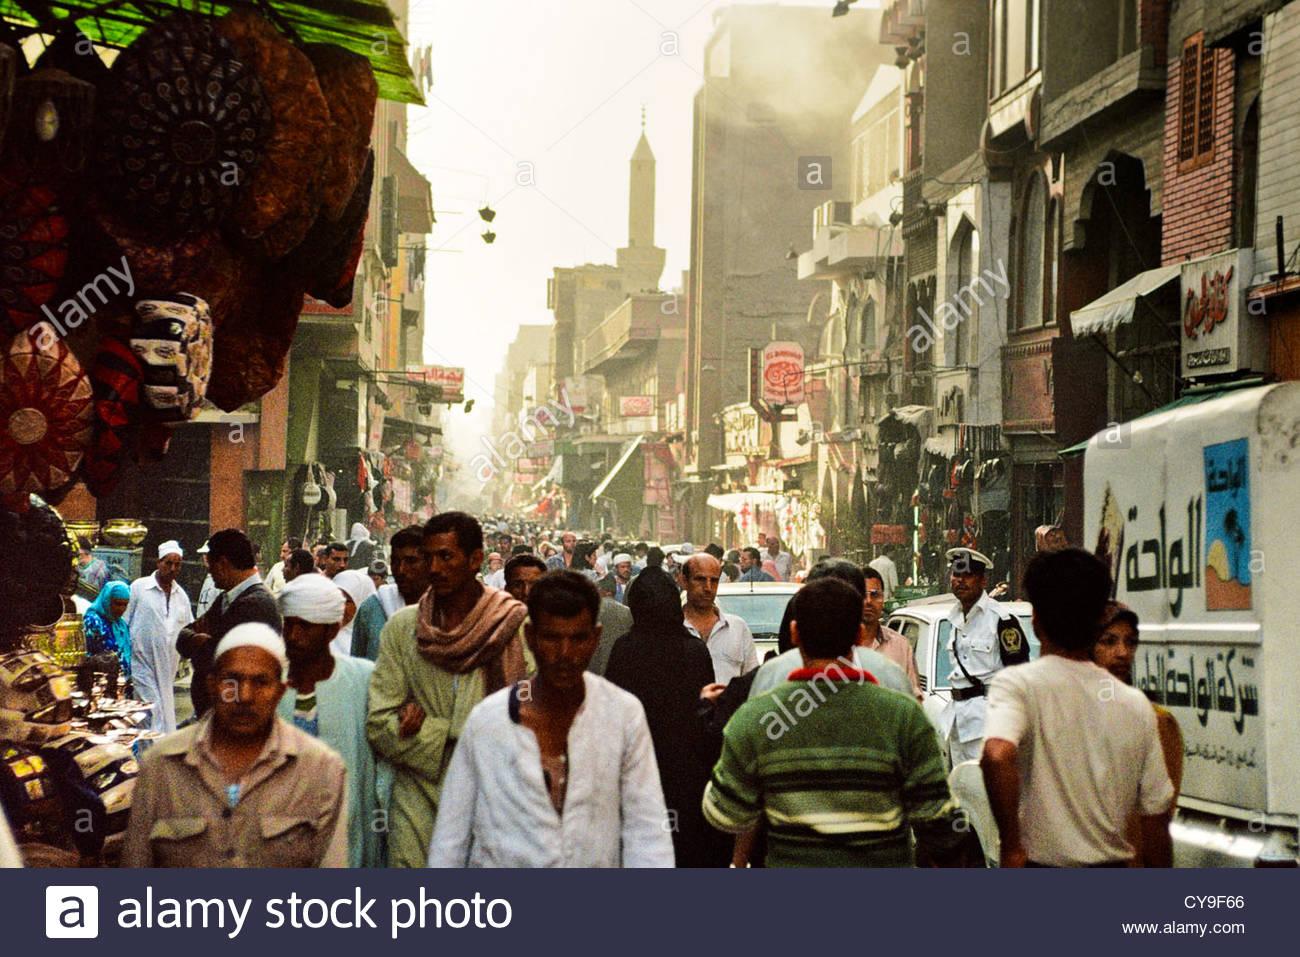 People walk through the street in the bazaar in old cairo Cairo shop